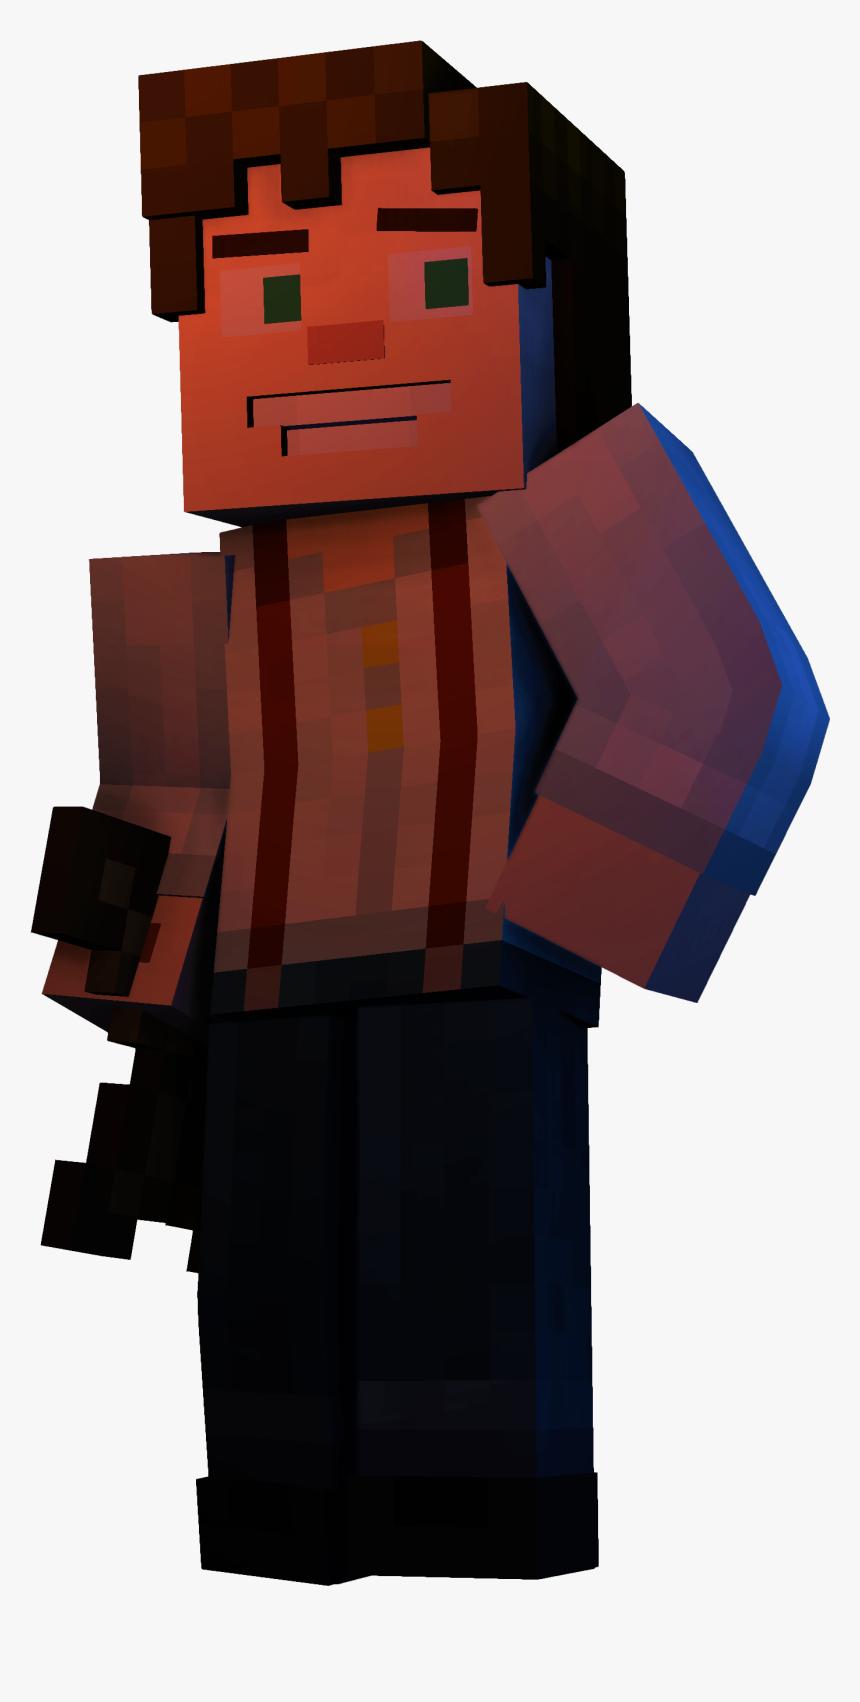 1lfmiox Male Jesse Minecraft Story Mode Hd Png Download Transparent Png Image Pngitem